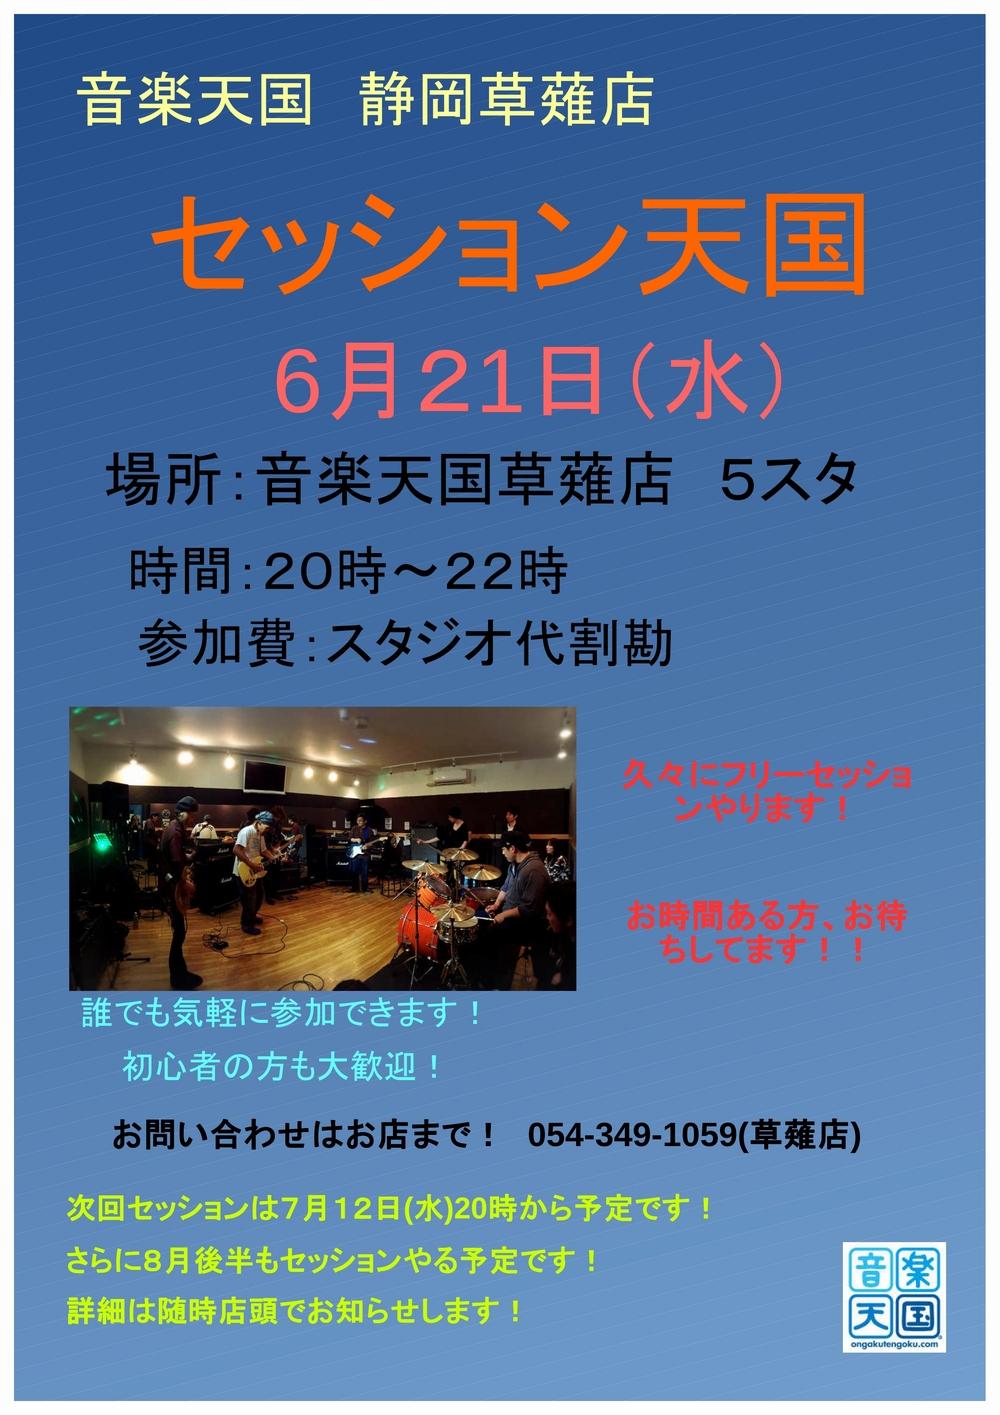 【セッション天国】音楽天国・静岡草薙店6月21日(水)開催